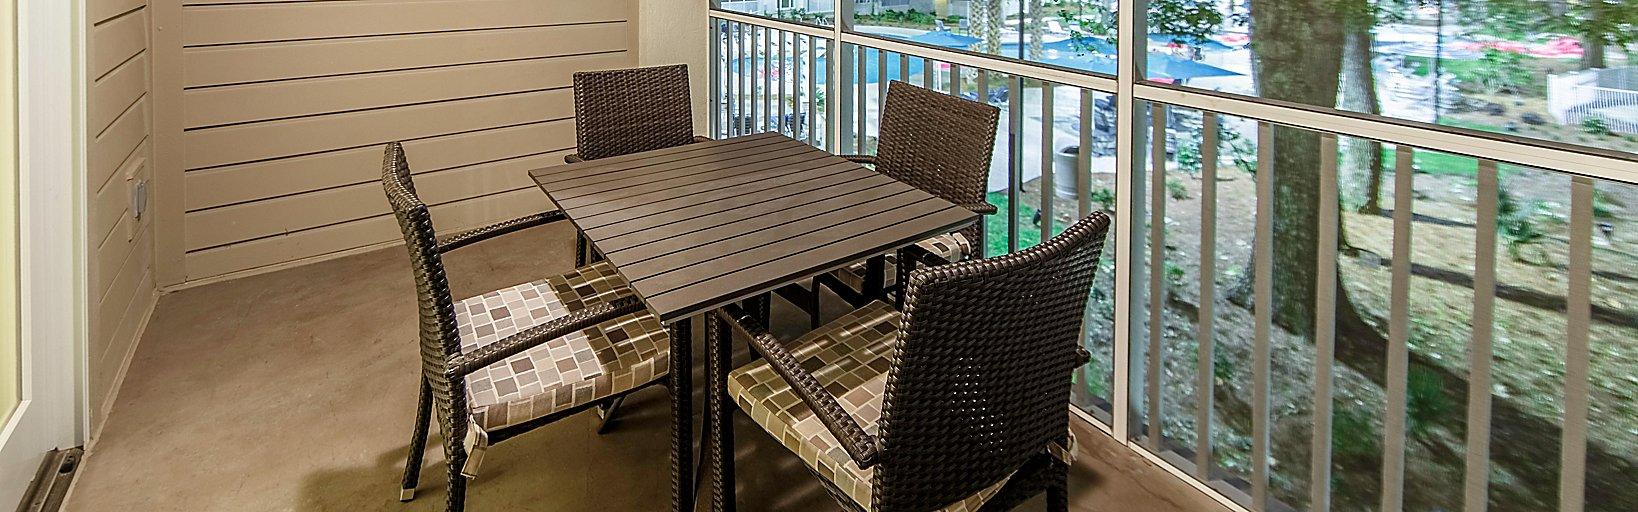 Restaurants Near Holiday Inn Club Vacations South Beach Resort